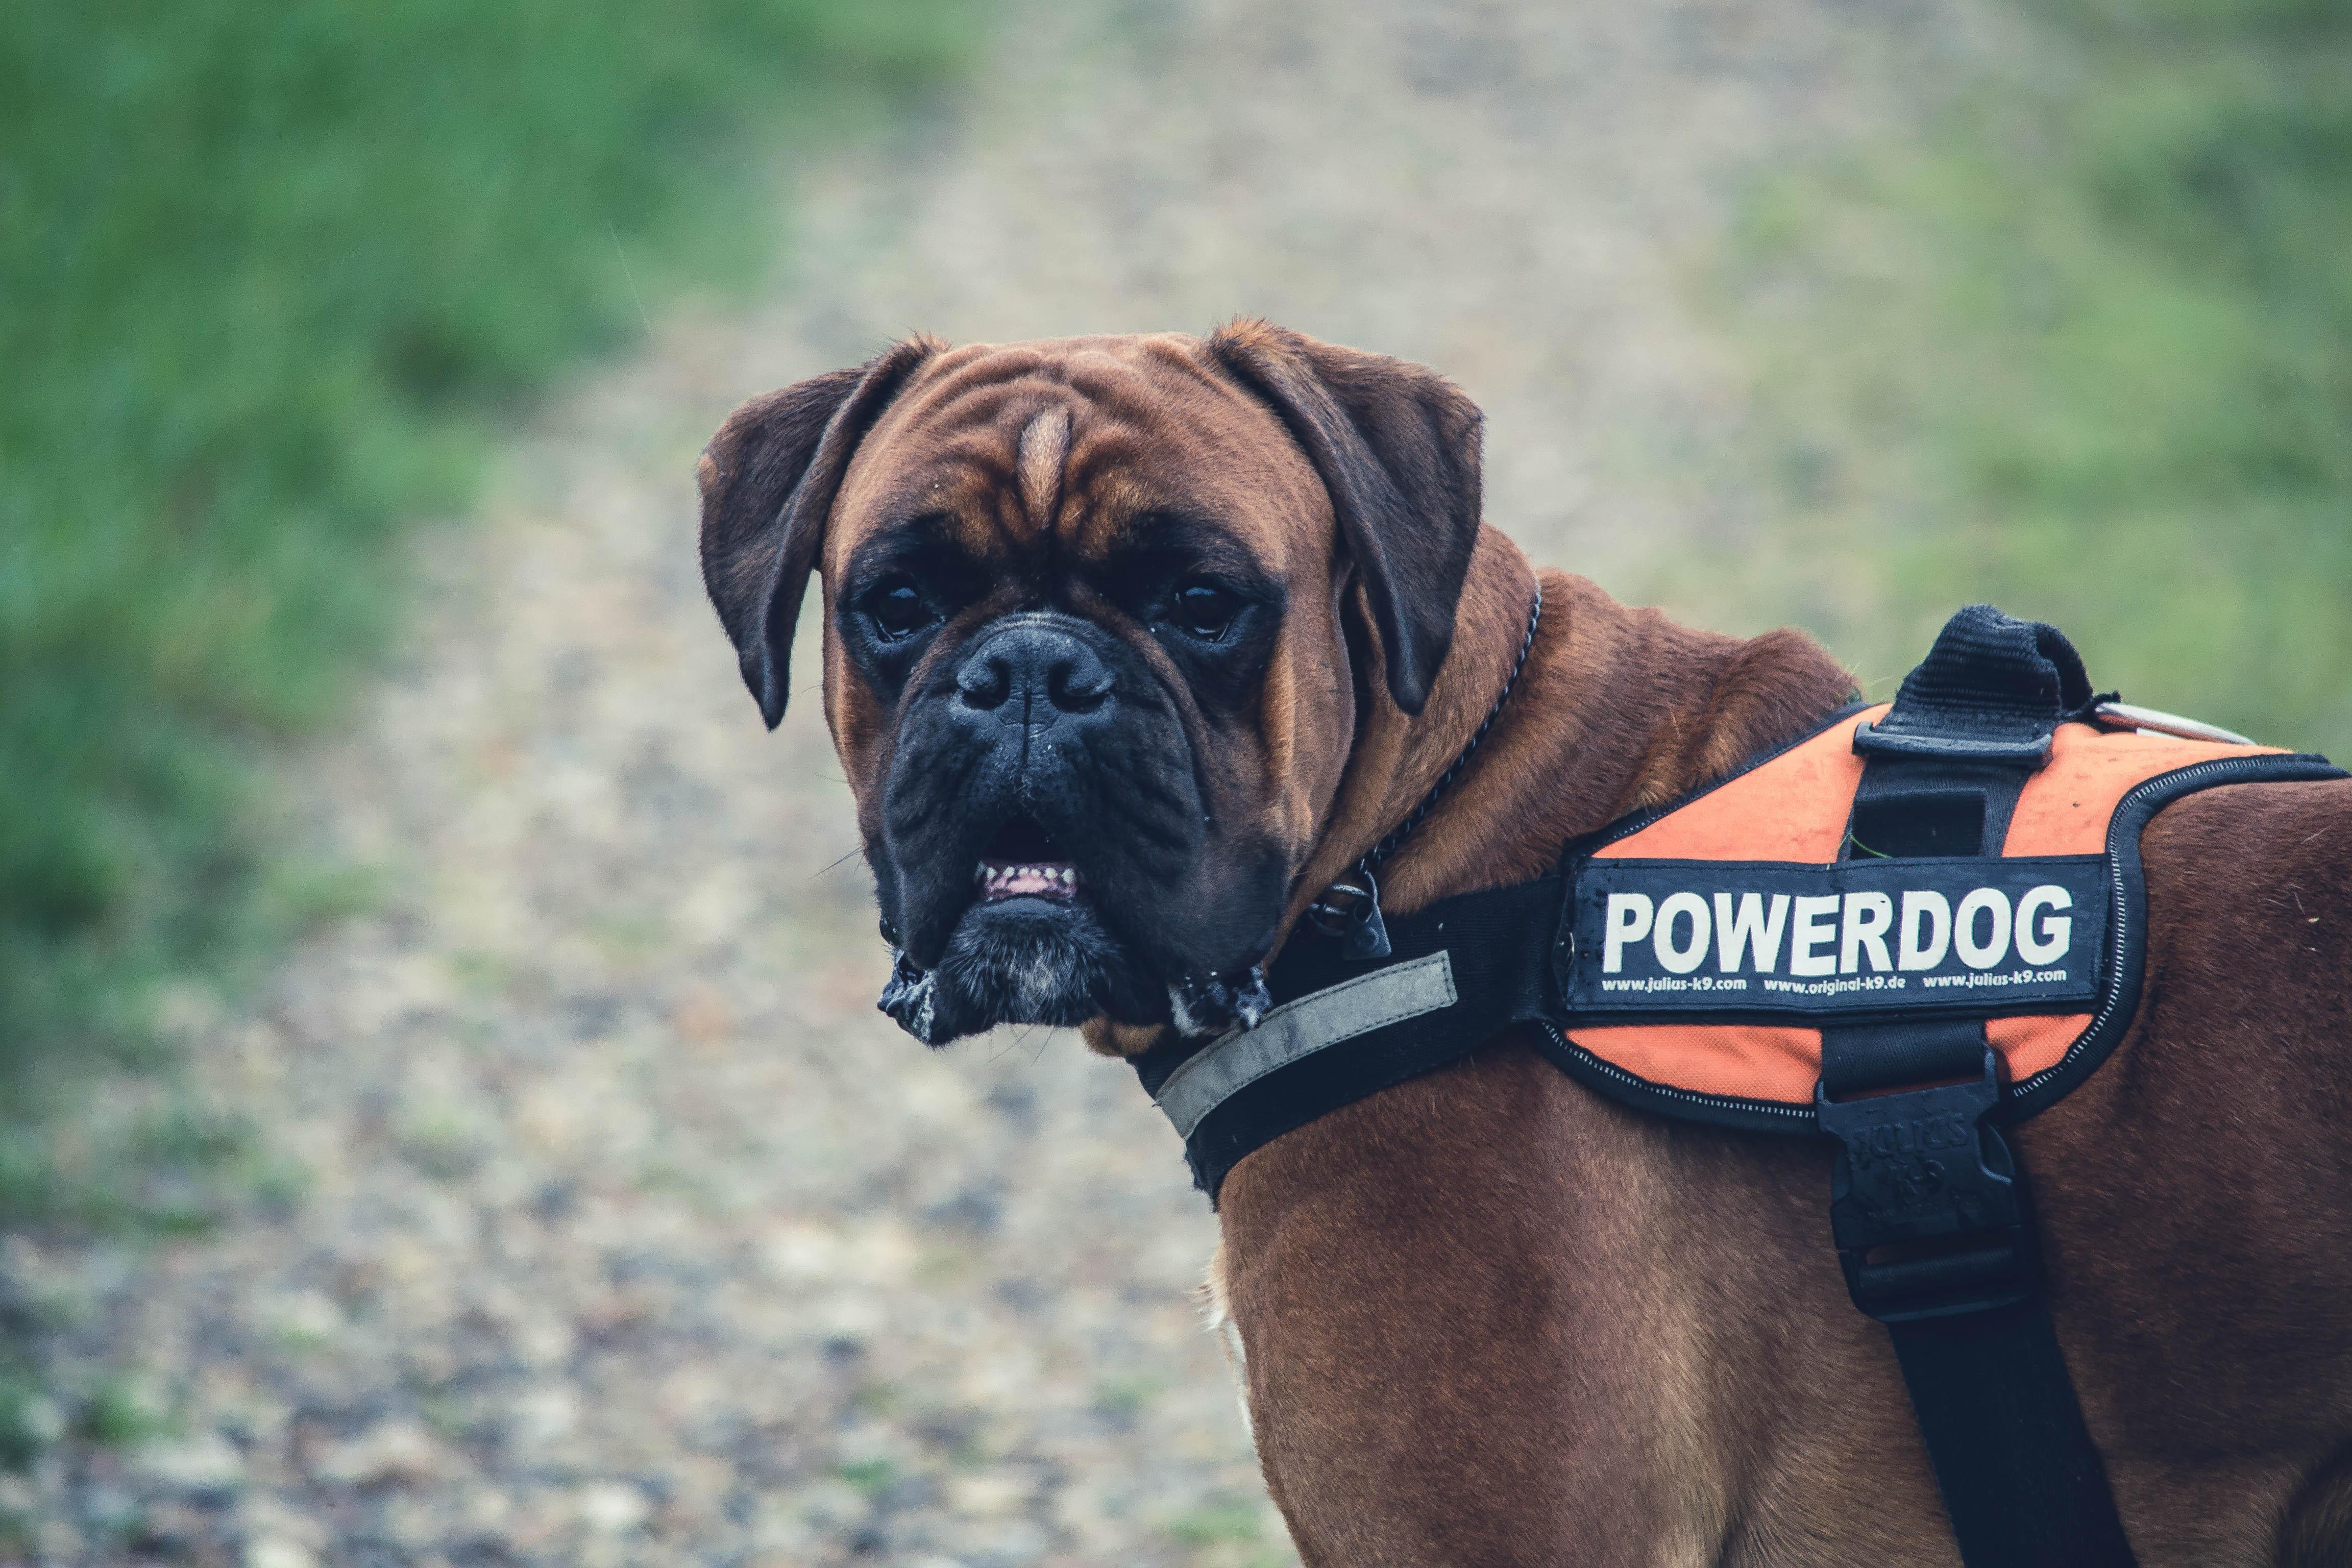 Brown Boxer Dog With Orange Black Powerdog Vest